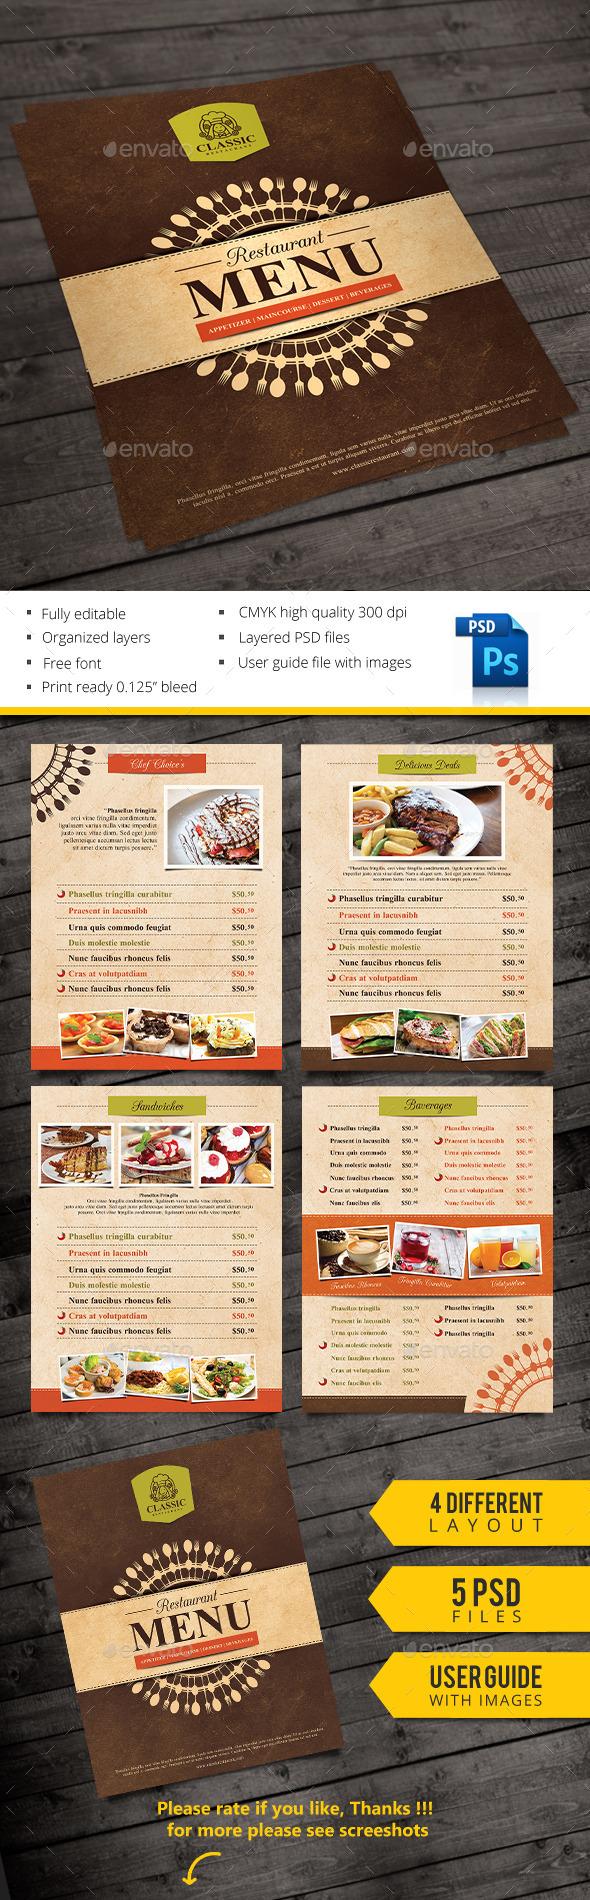 Classic Menu - Restaurant Flyers